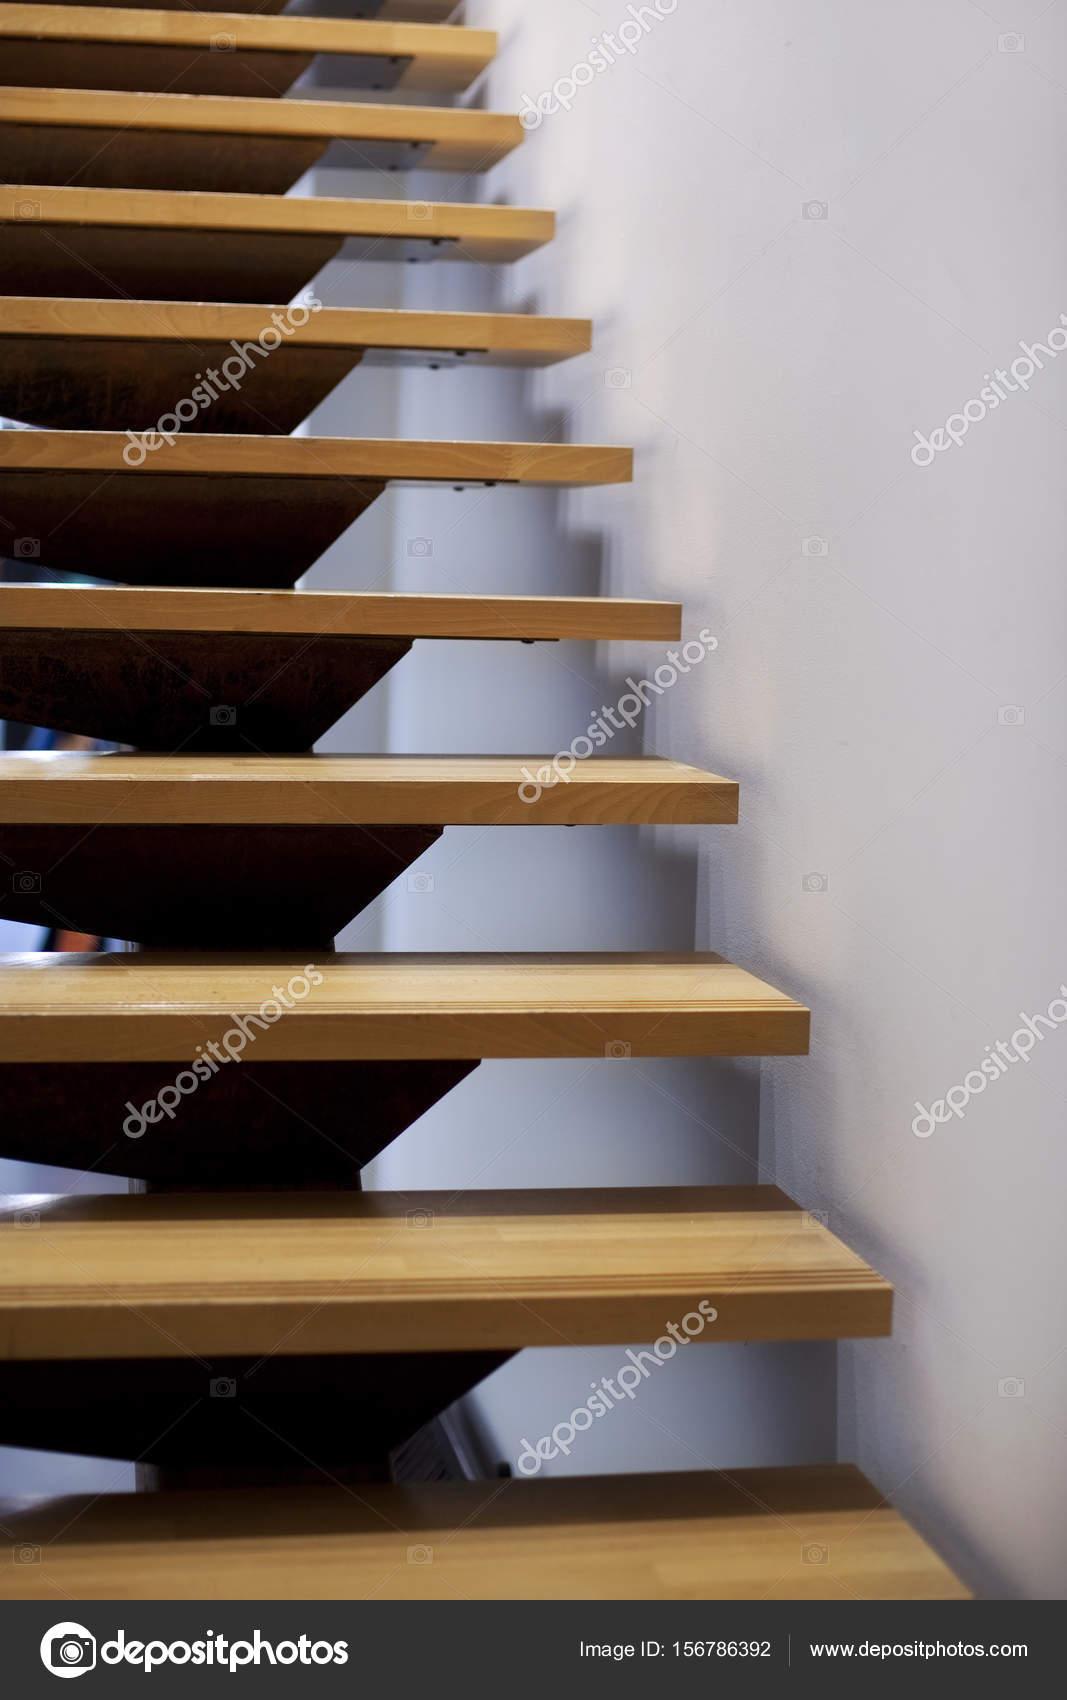 Escaleras de madera modernas fotos de stock - Escaleras de madera modernas ...